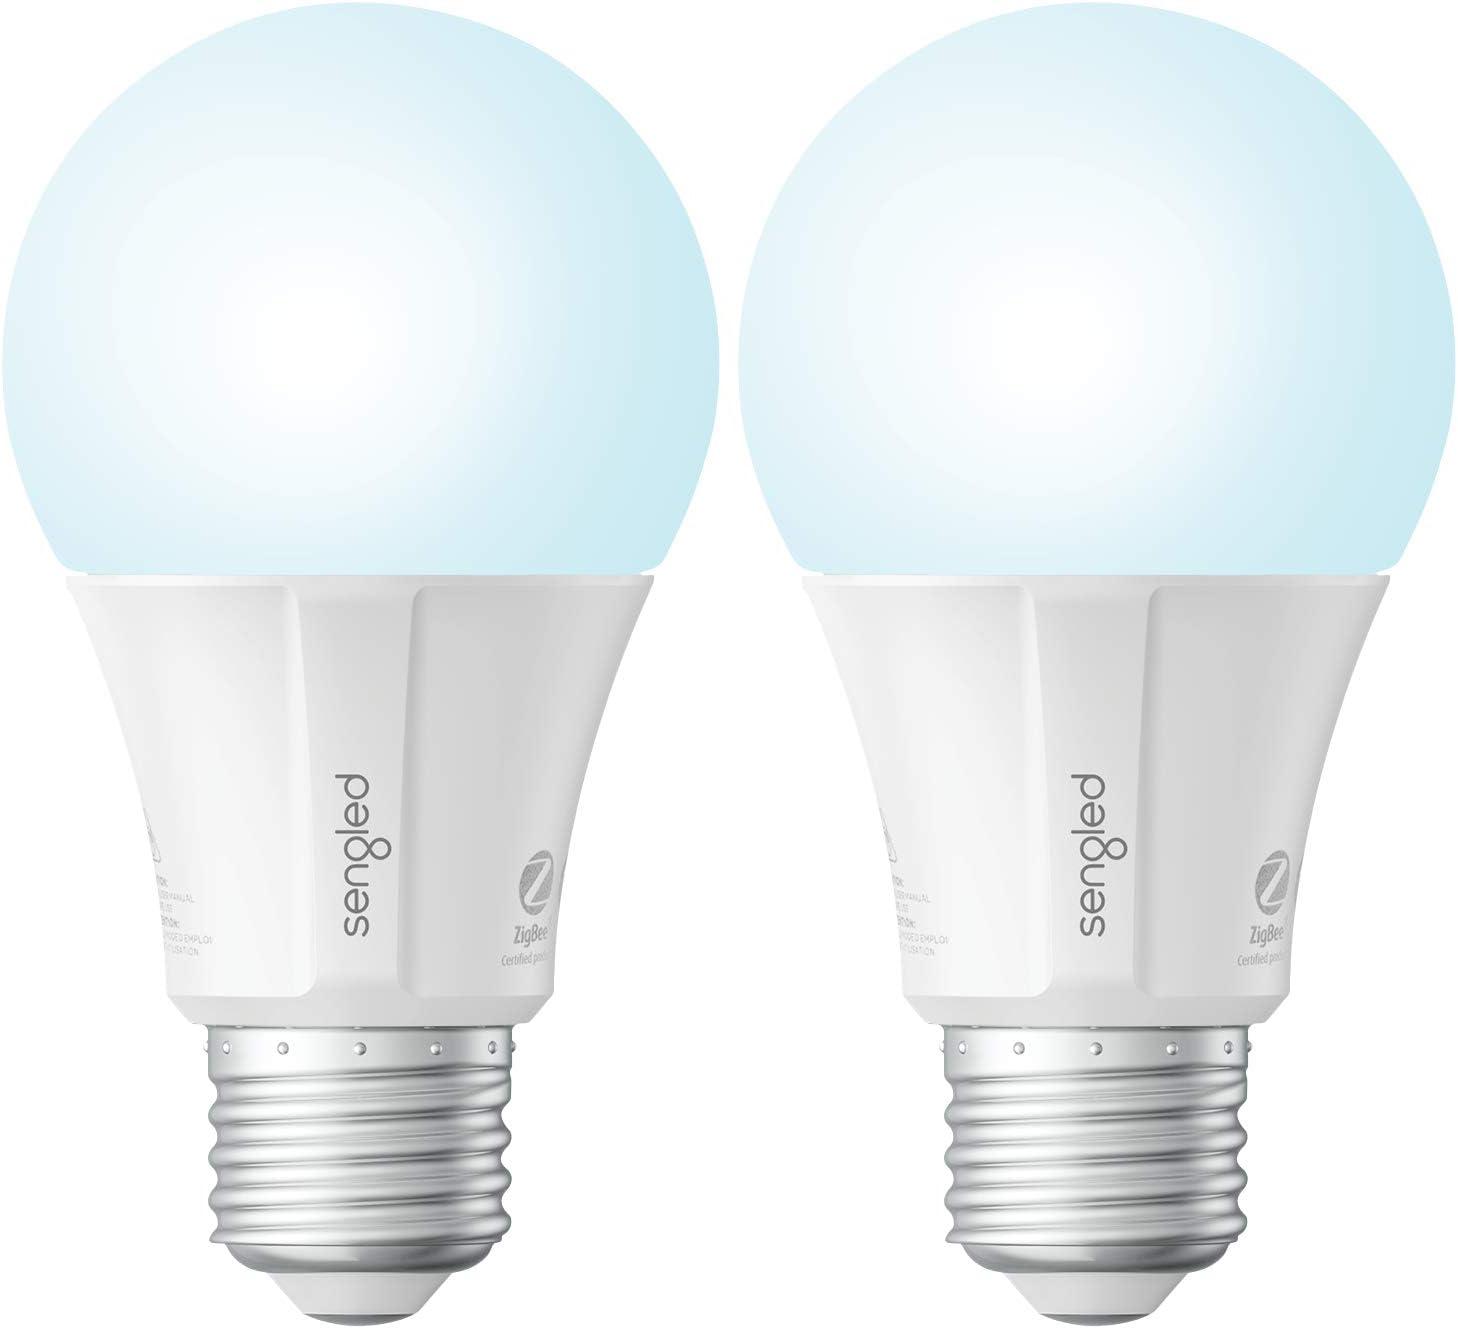 Sengled Smart Light Bulb, Smart Bulbs That Work with Alexa, Google Home (Smart Hub Required), Smart Bulb A19 Alexa Light Bulbs, Smart LED Daylight (5000K), 800LM, 9W (60w Equivalent), 2 Pack